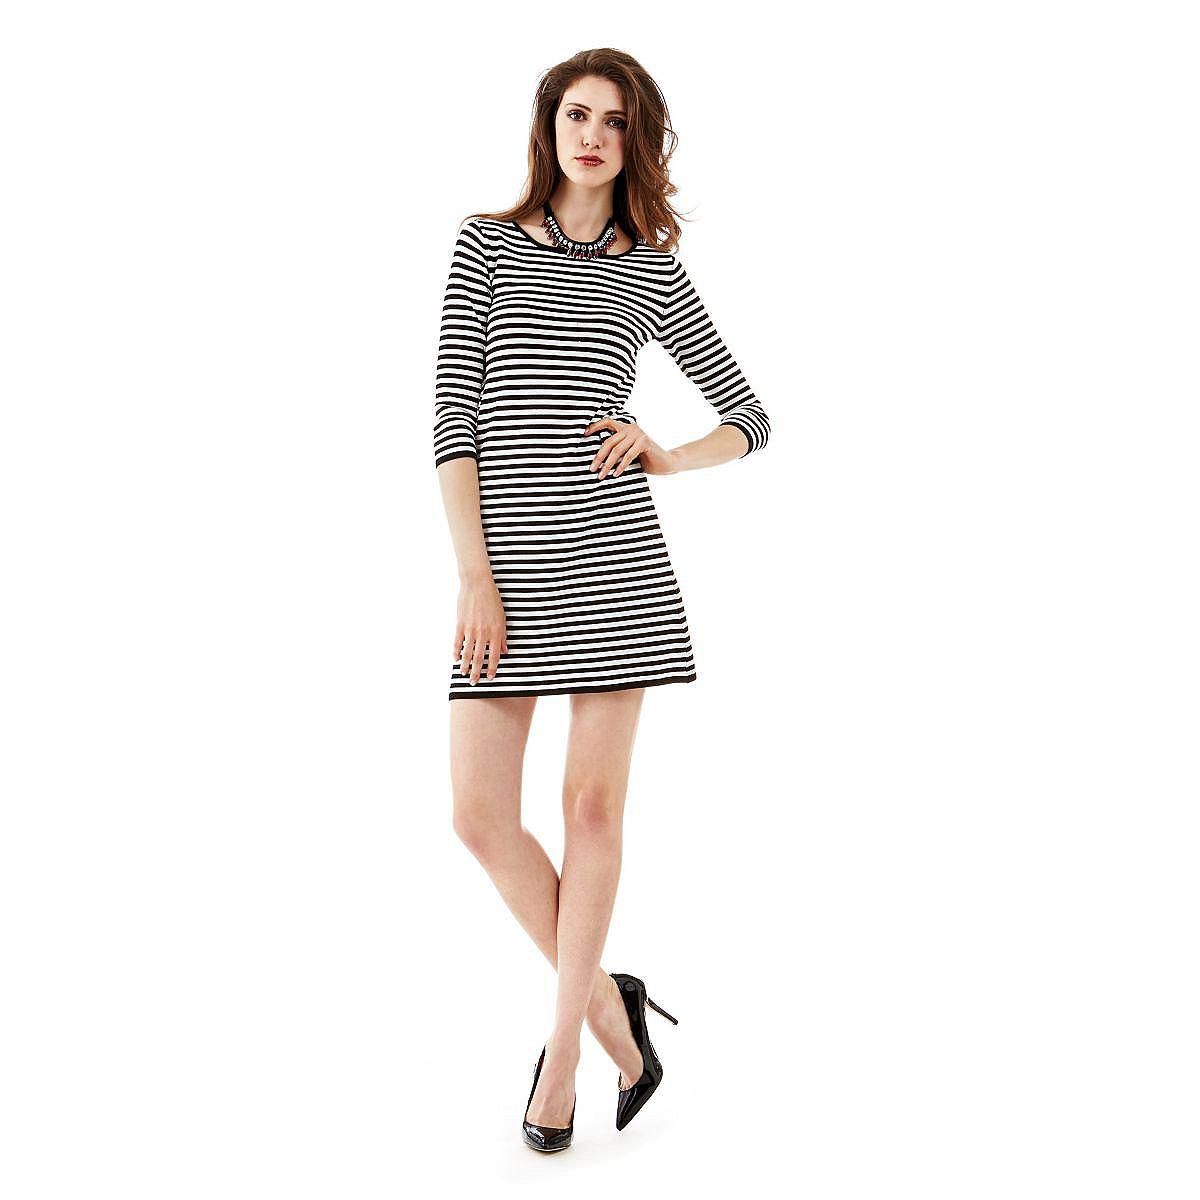 Guess jurk A-line printed met 3/4-mouwen multicolor